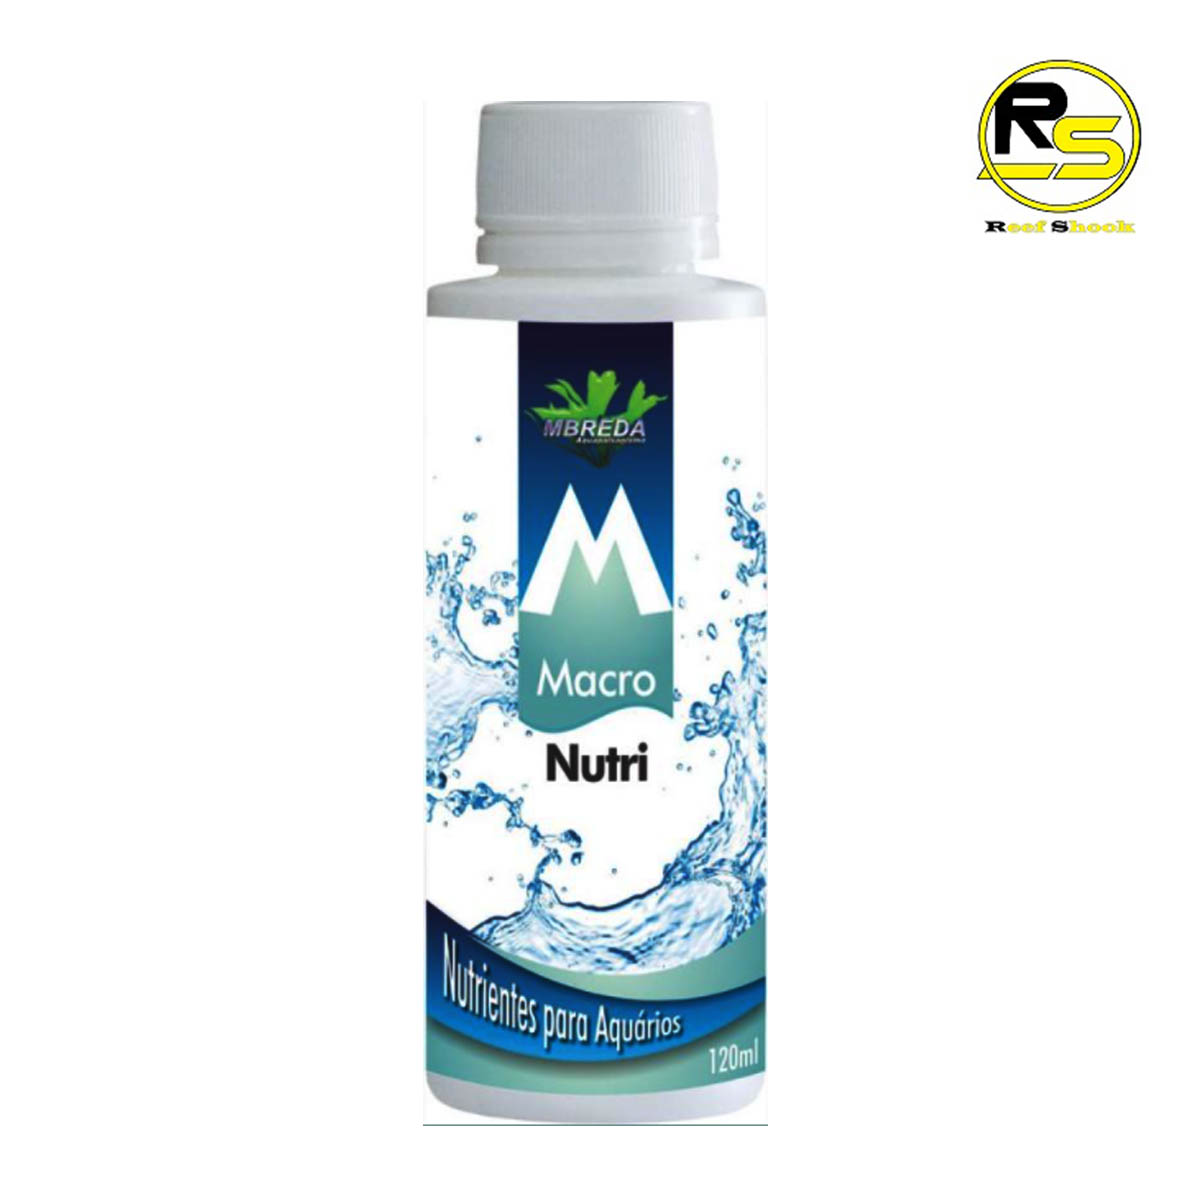 Macronutri Fertilizante Mbreda 120ml para Aquario Plantado